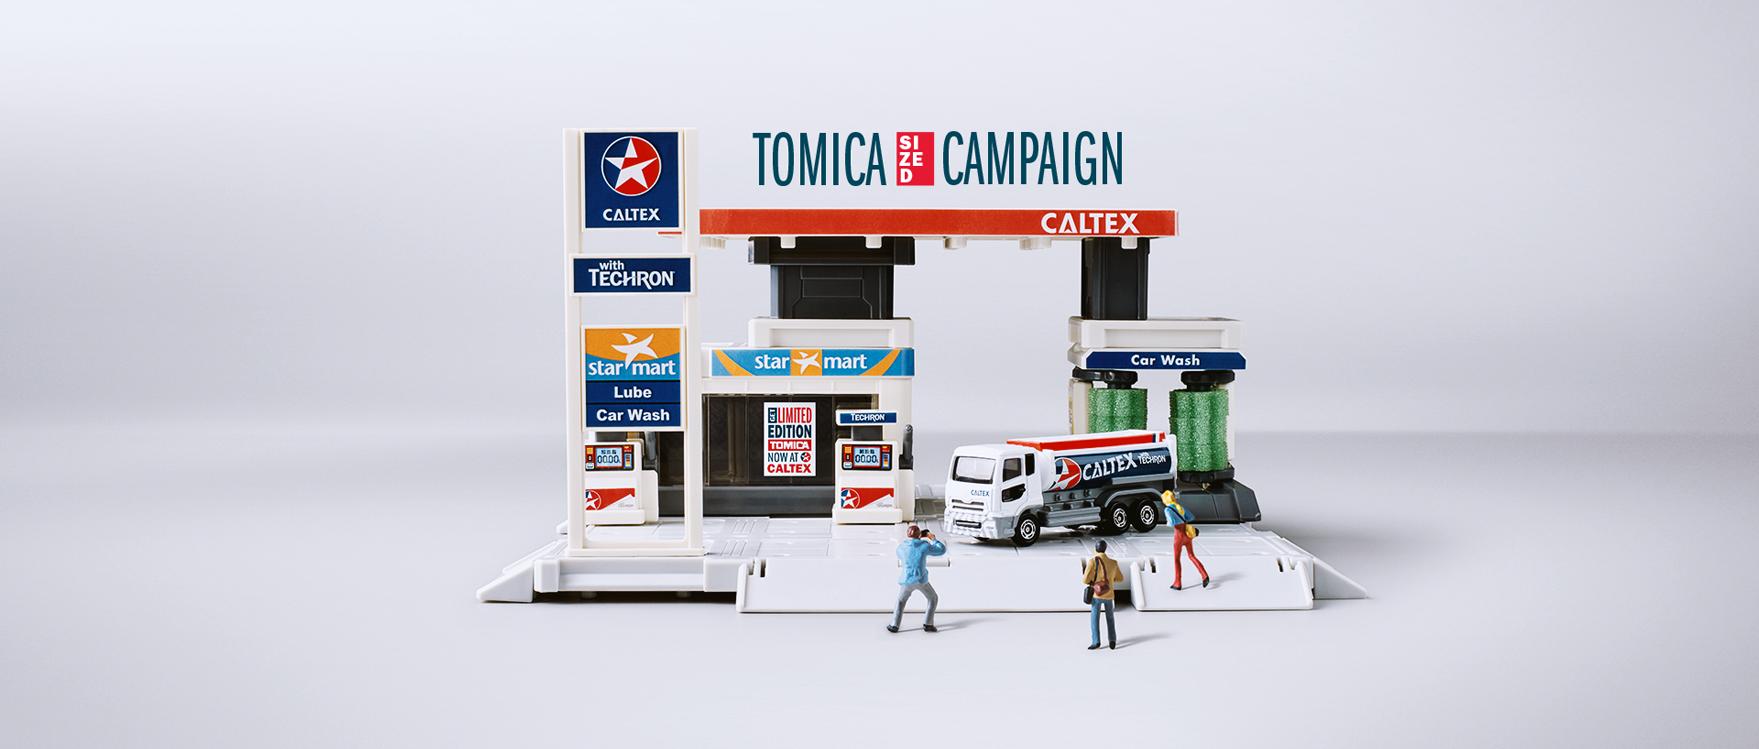 CaltexTomica_Tripa_small2020_09